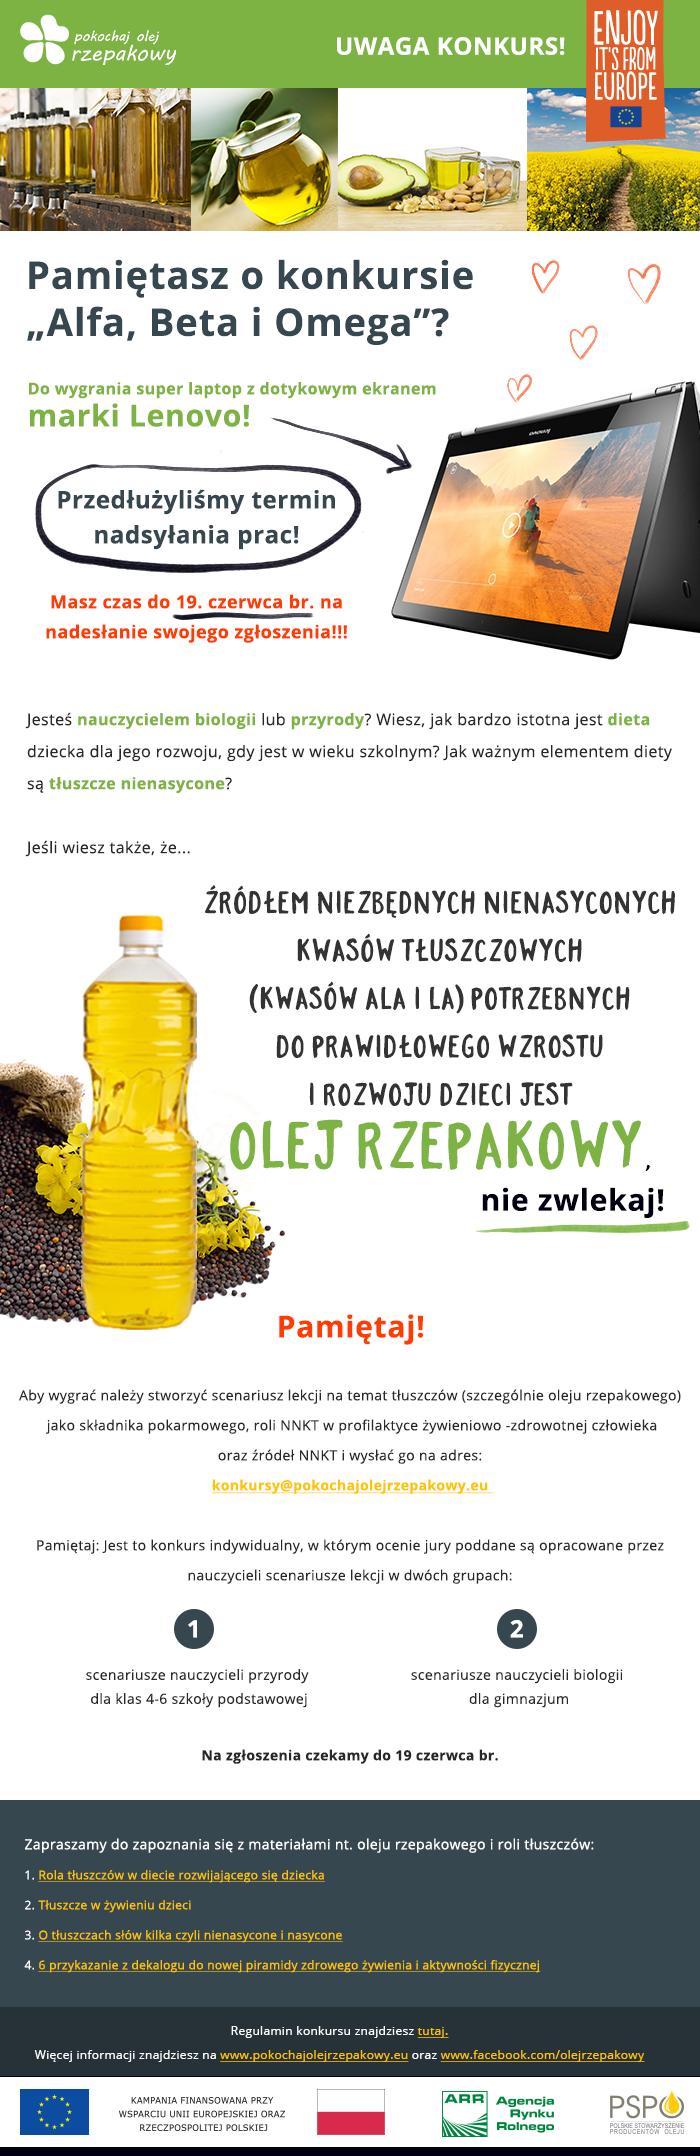 alfa_beta_omega_konkurs_cz2